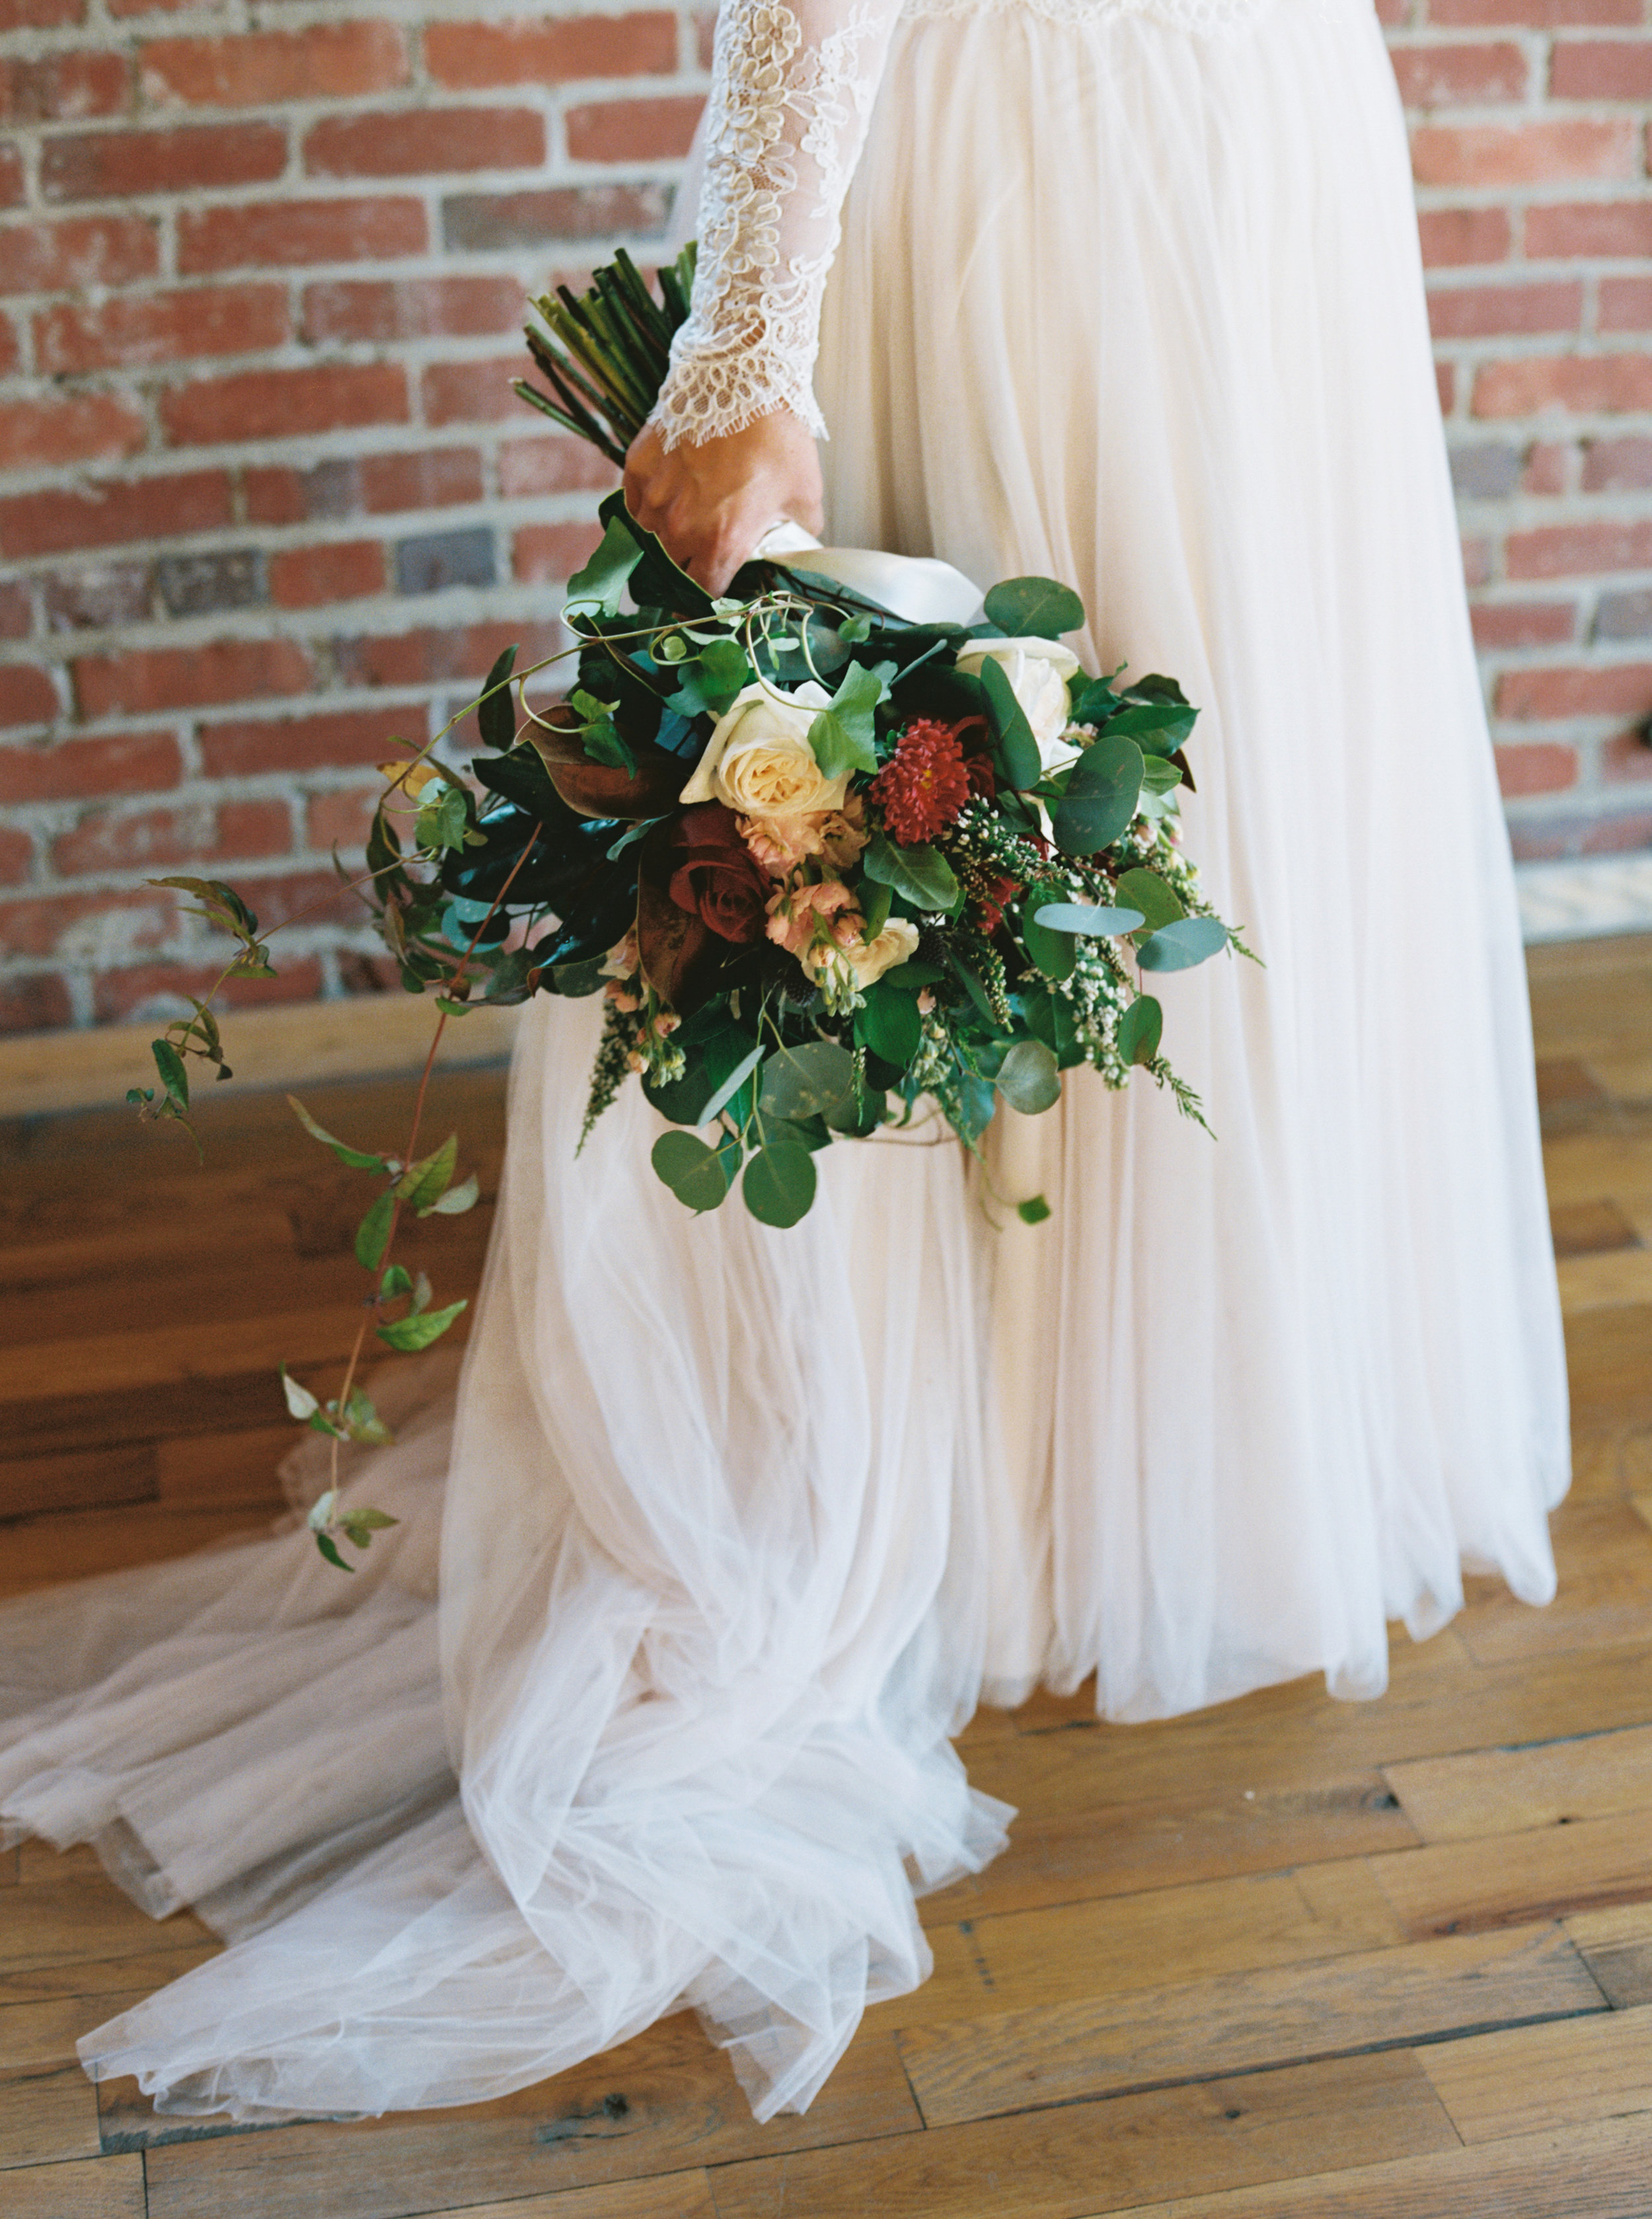 Lauren_Jeremy_Standard_Wedding_Knoxville_Abigail_Malone_Photography_FIlm-120.jpg